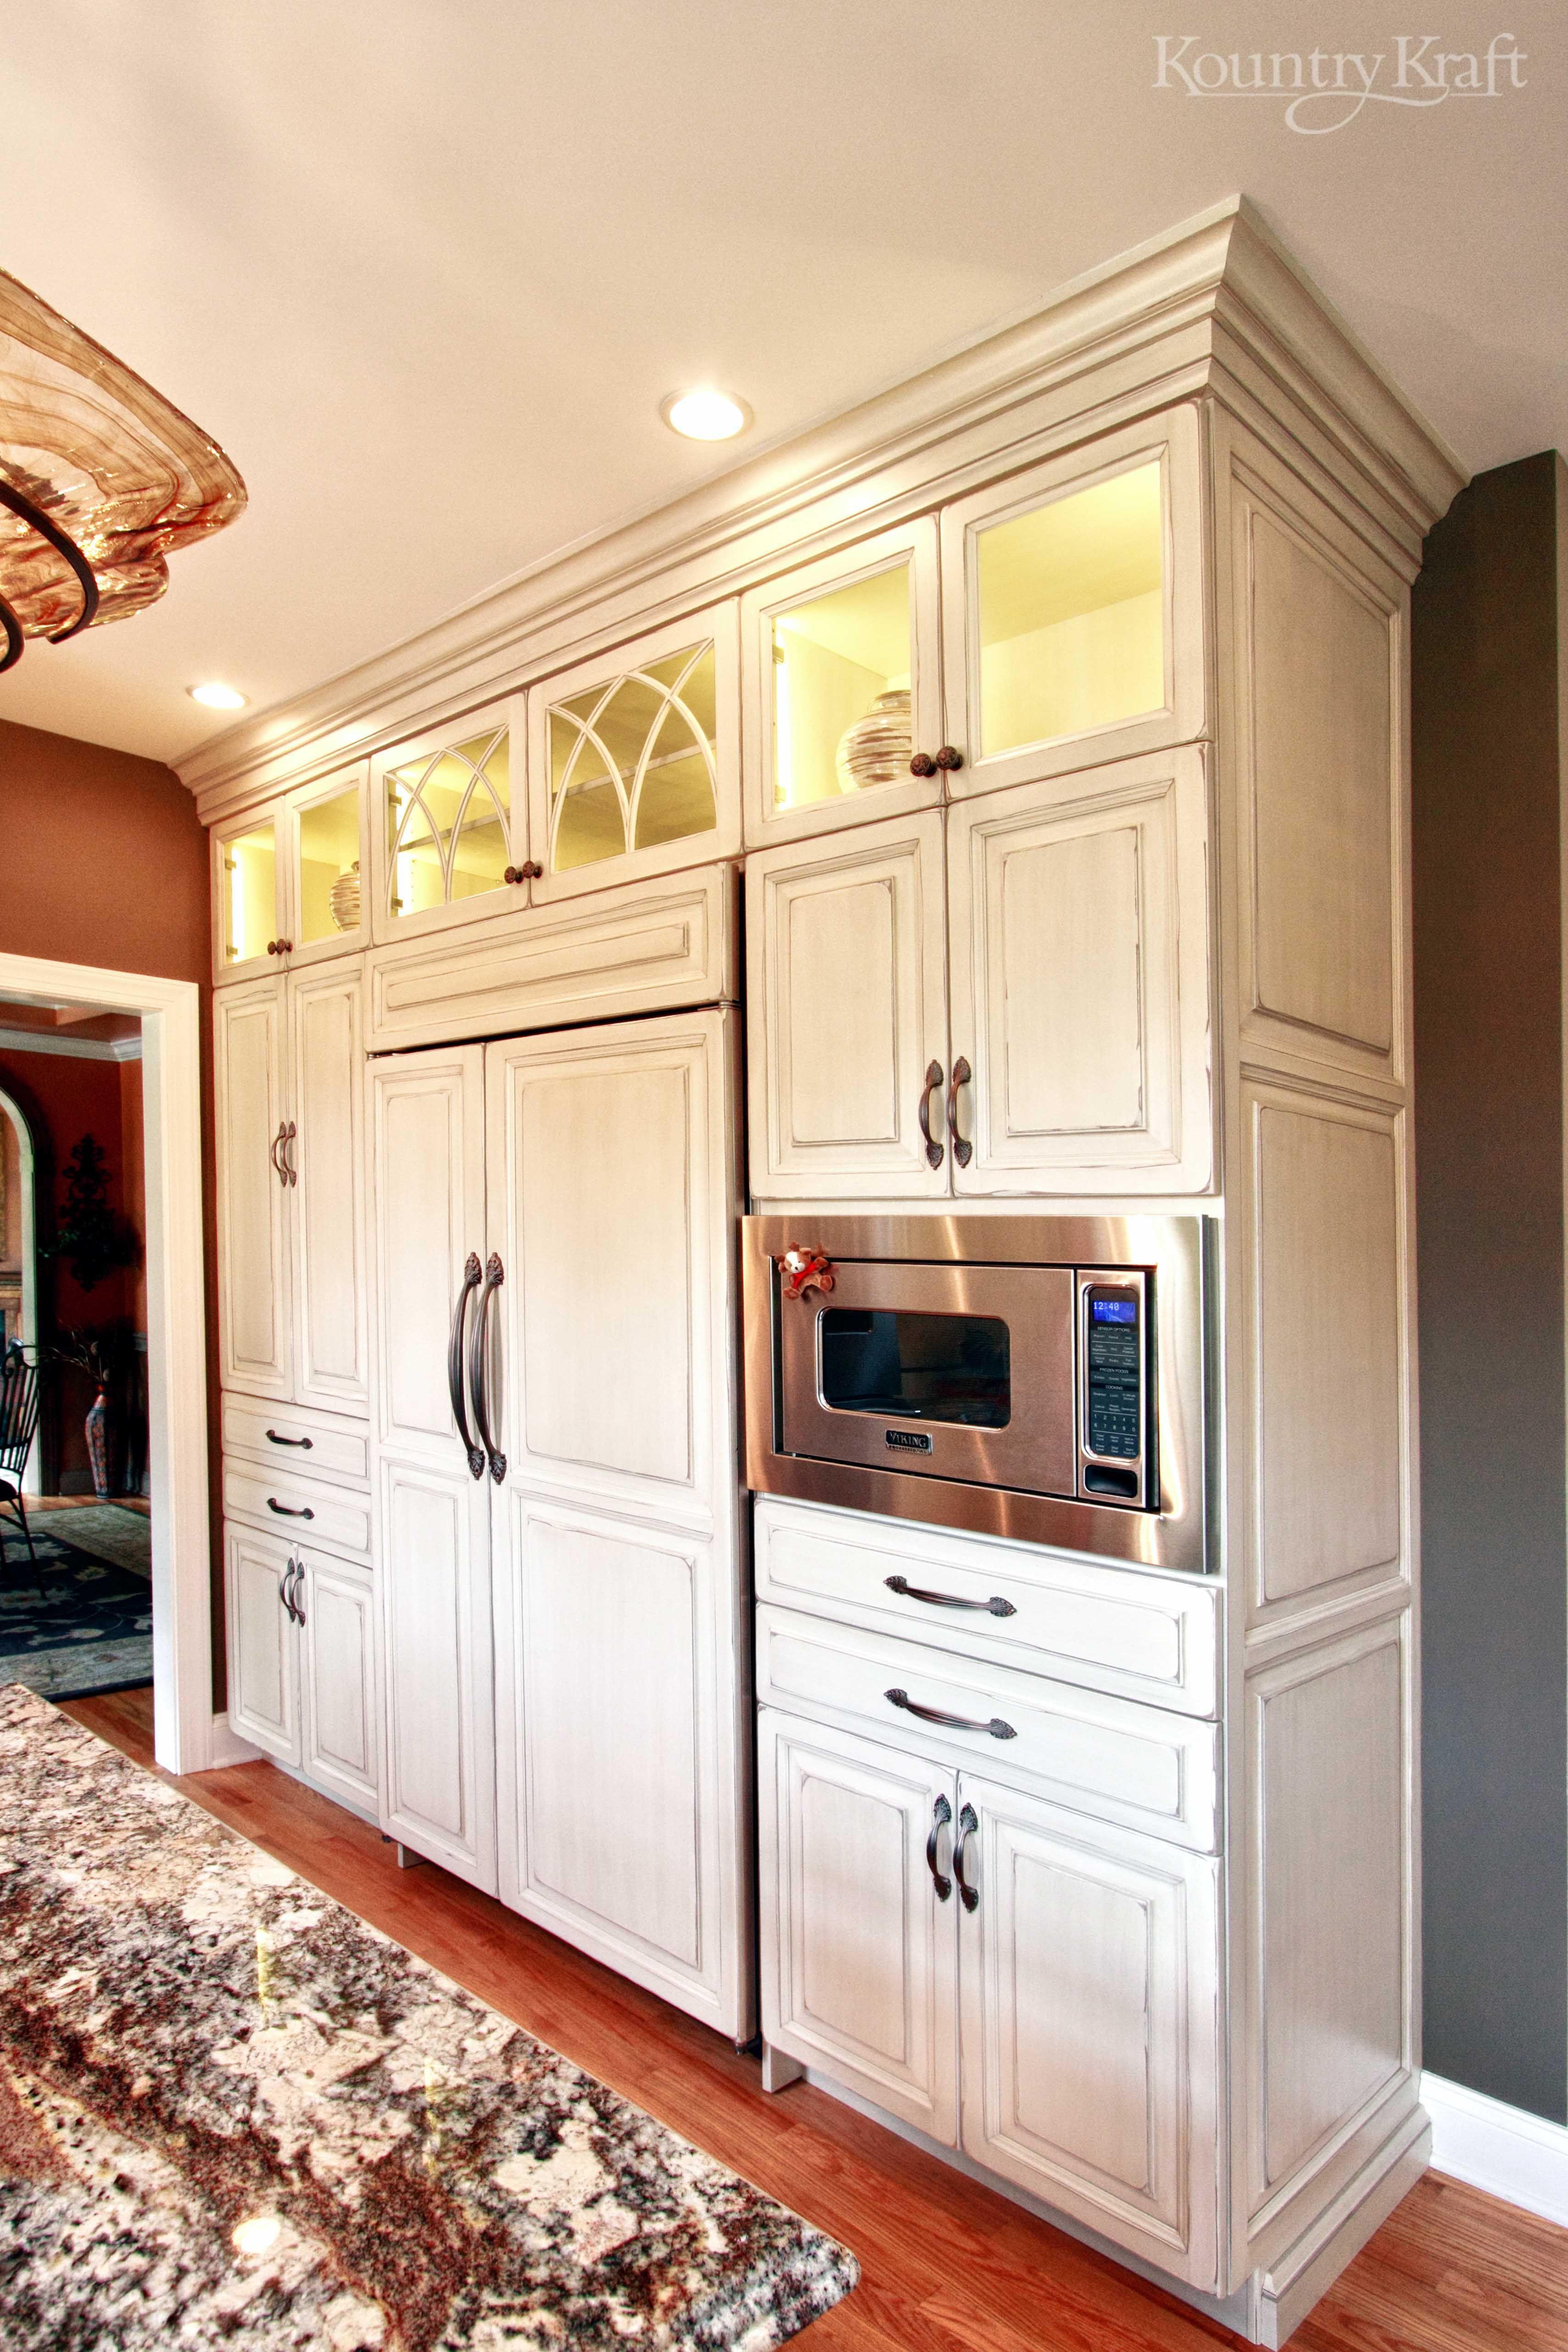 Customcabinets Extonpennsylvania Kountrykraft Https Www Kountrykraft Com Kitchen Cabinets Decor Custom Kitchen Cabinets Kitchen Cabinet Remodel